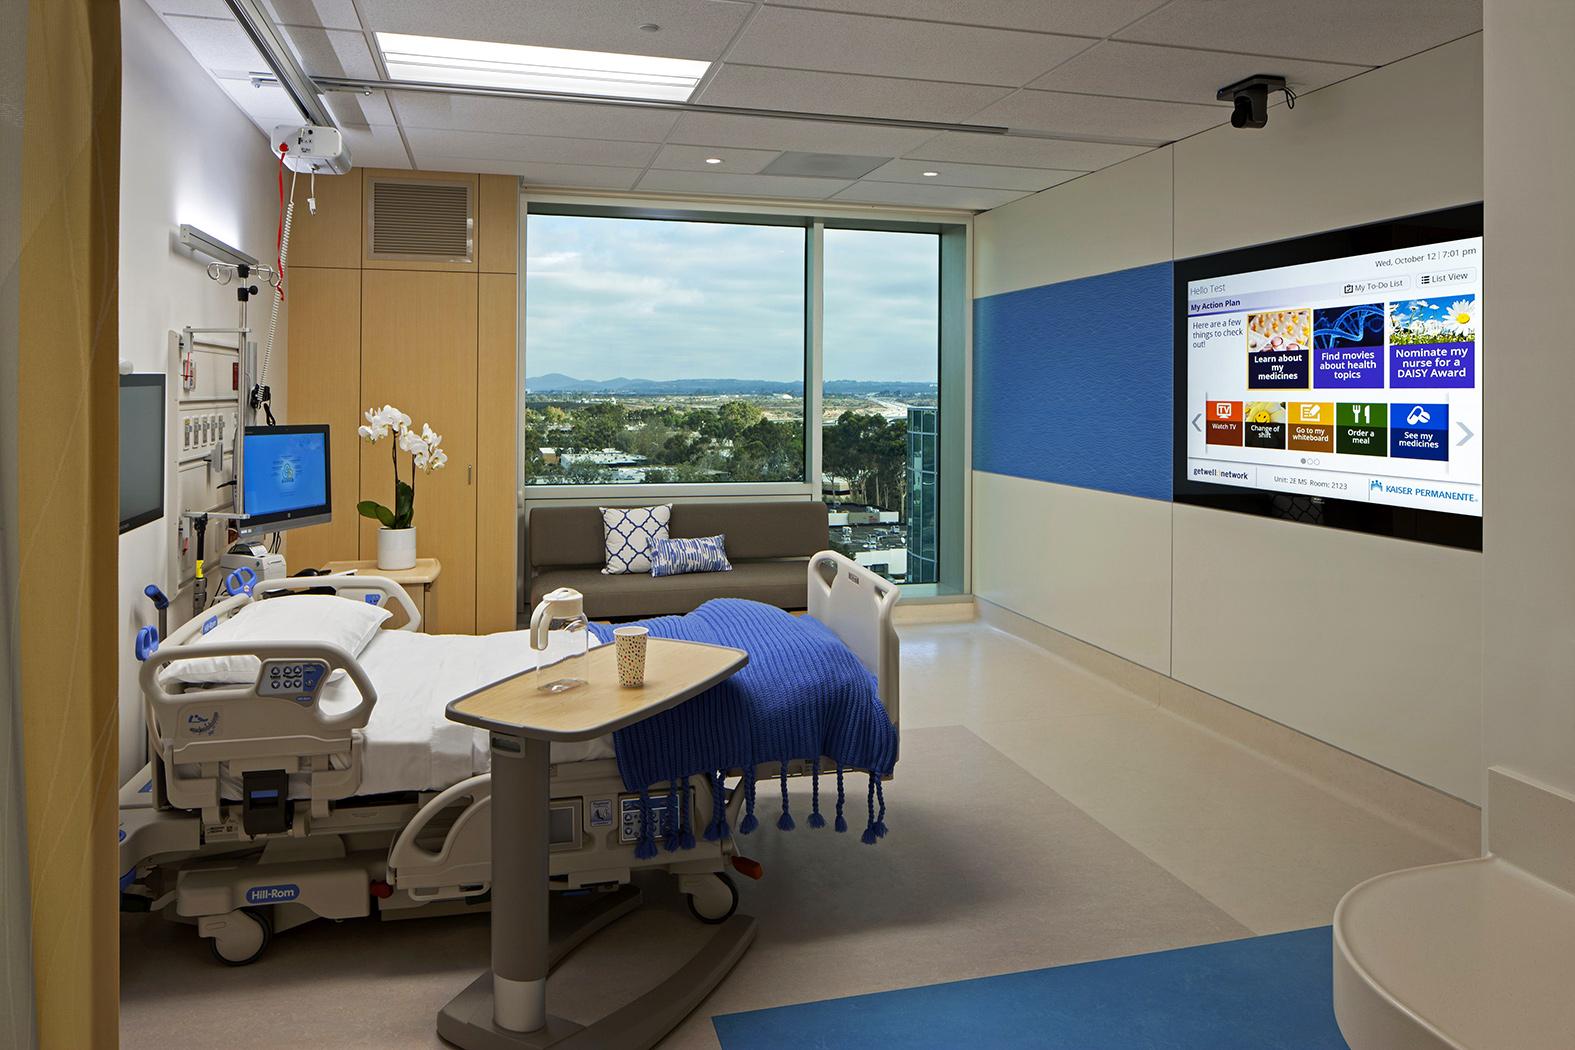 Manteca Emergency Room